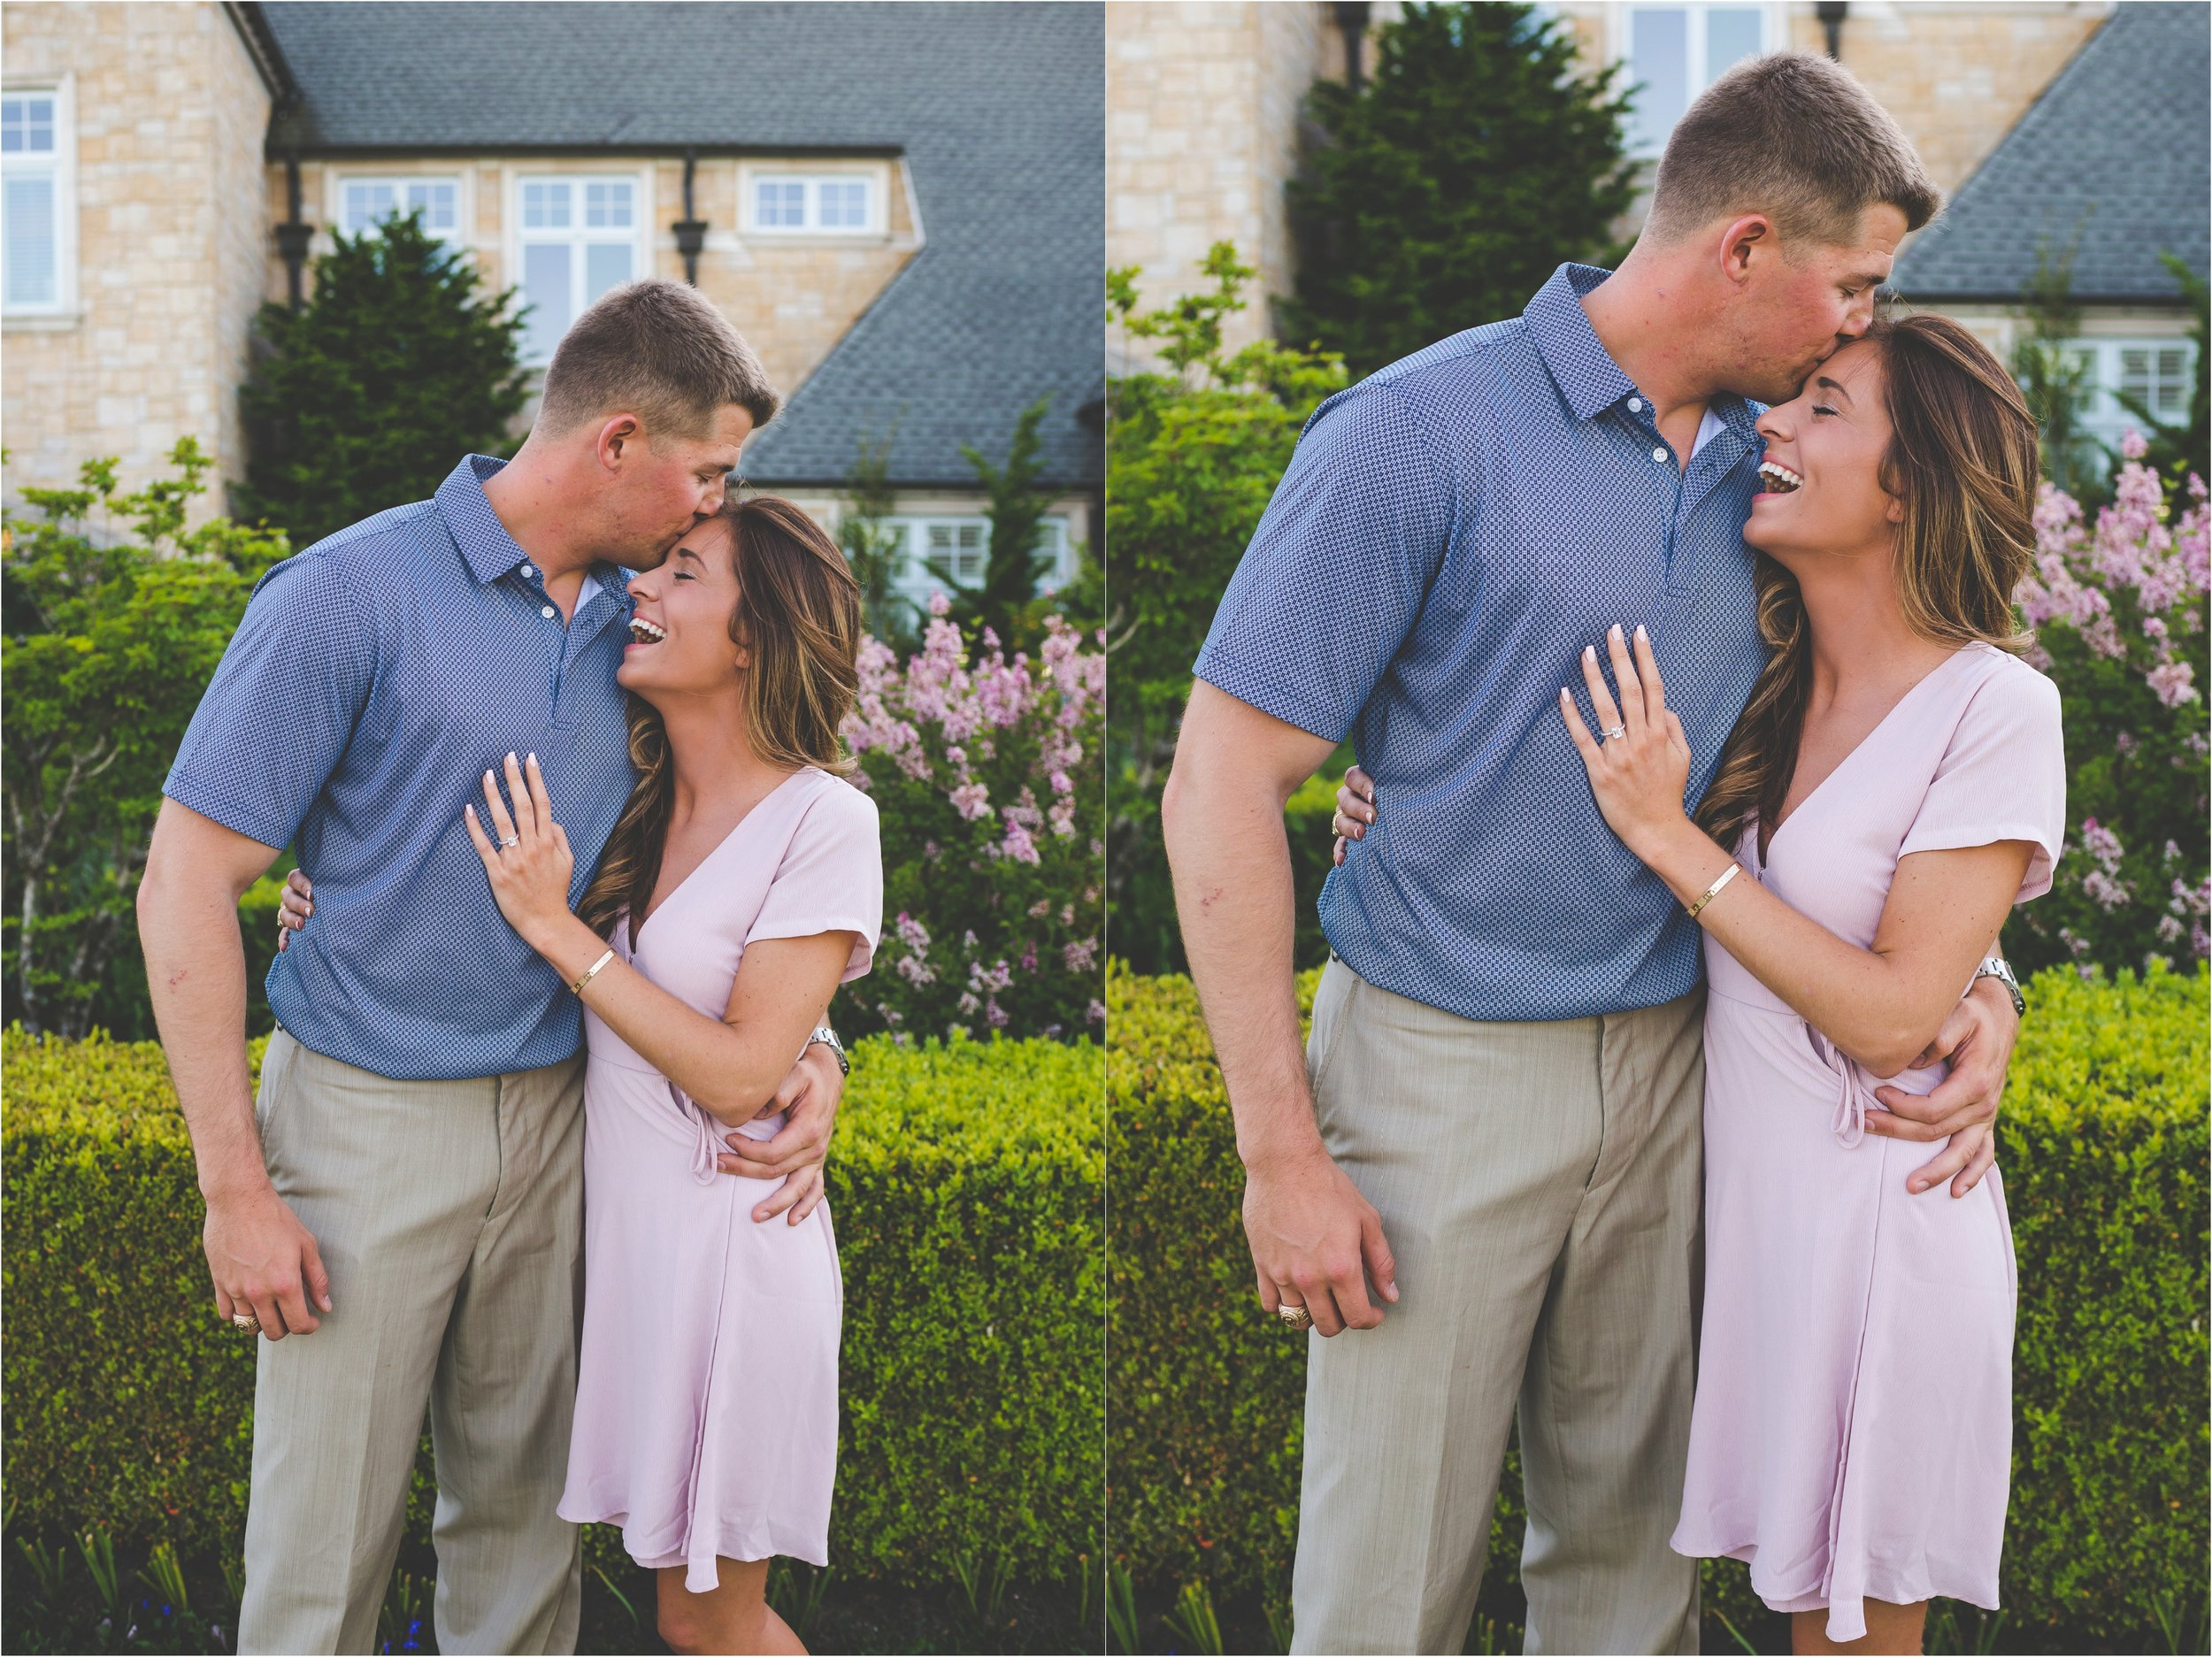 newcastle-golf-club-proposal-jannicka-mayte-seattle-washington-engagement-wedding-photographer_0042.jpg